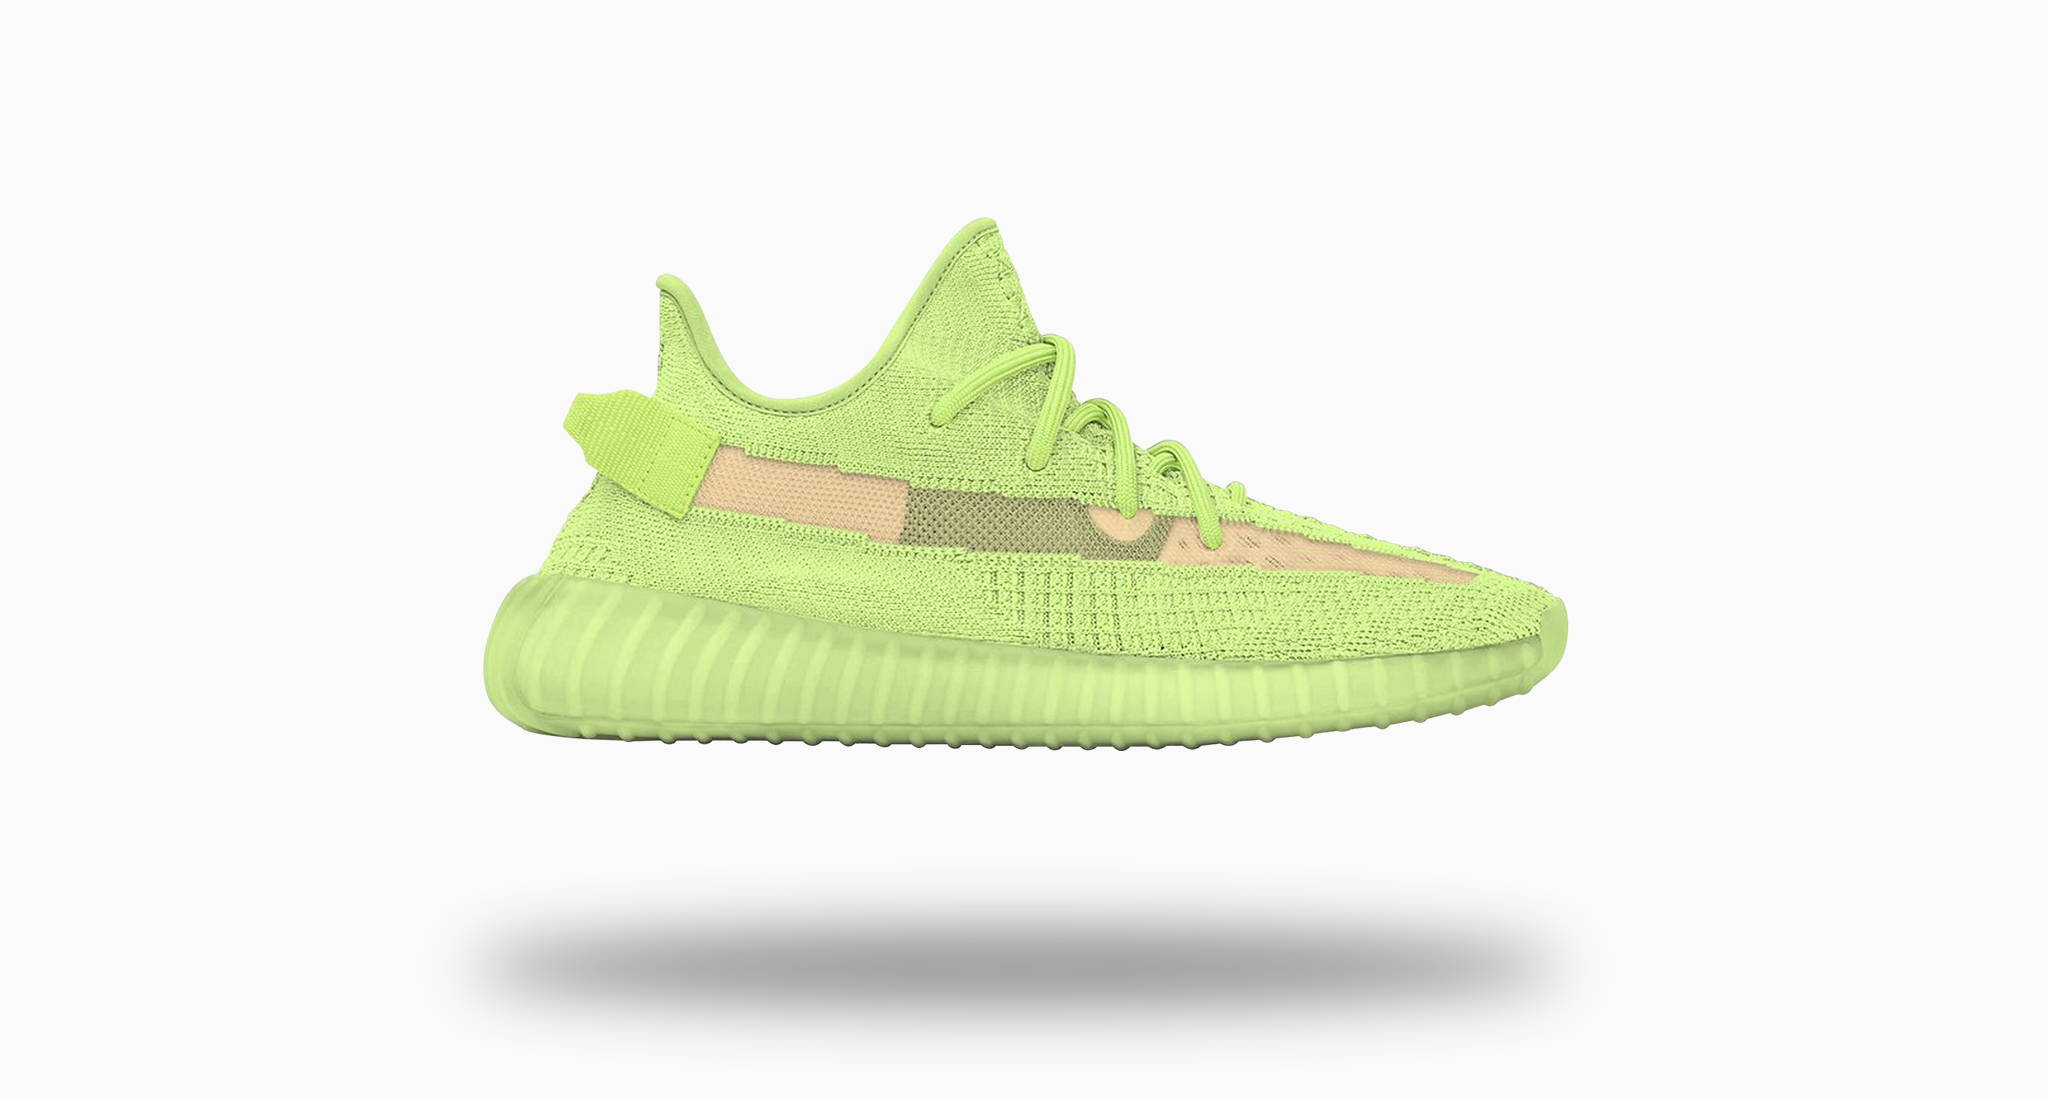 552988483 Adidas YEEZY Boost 350 V2 Glow In The Dark – Rsvp Kingz